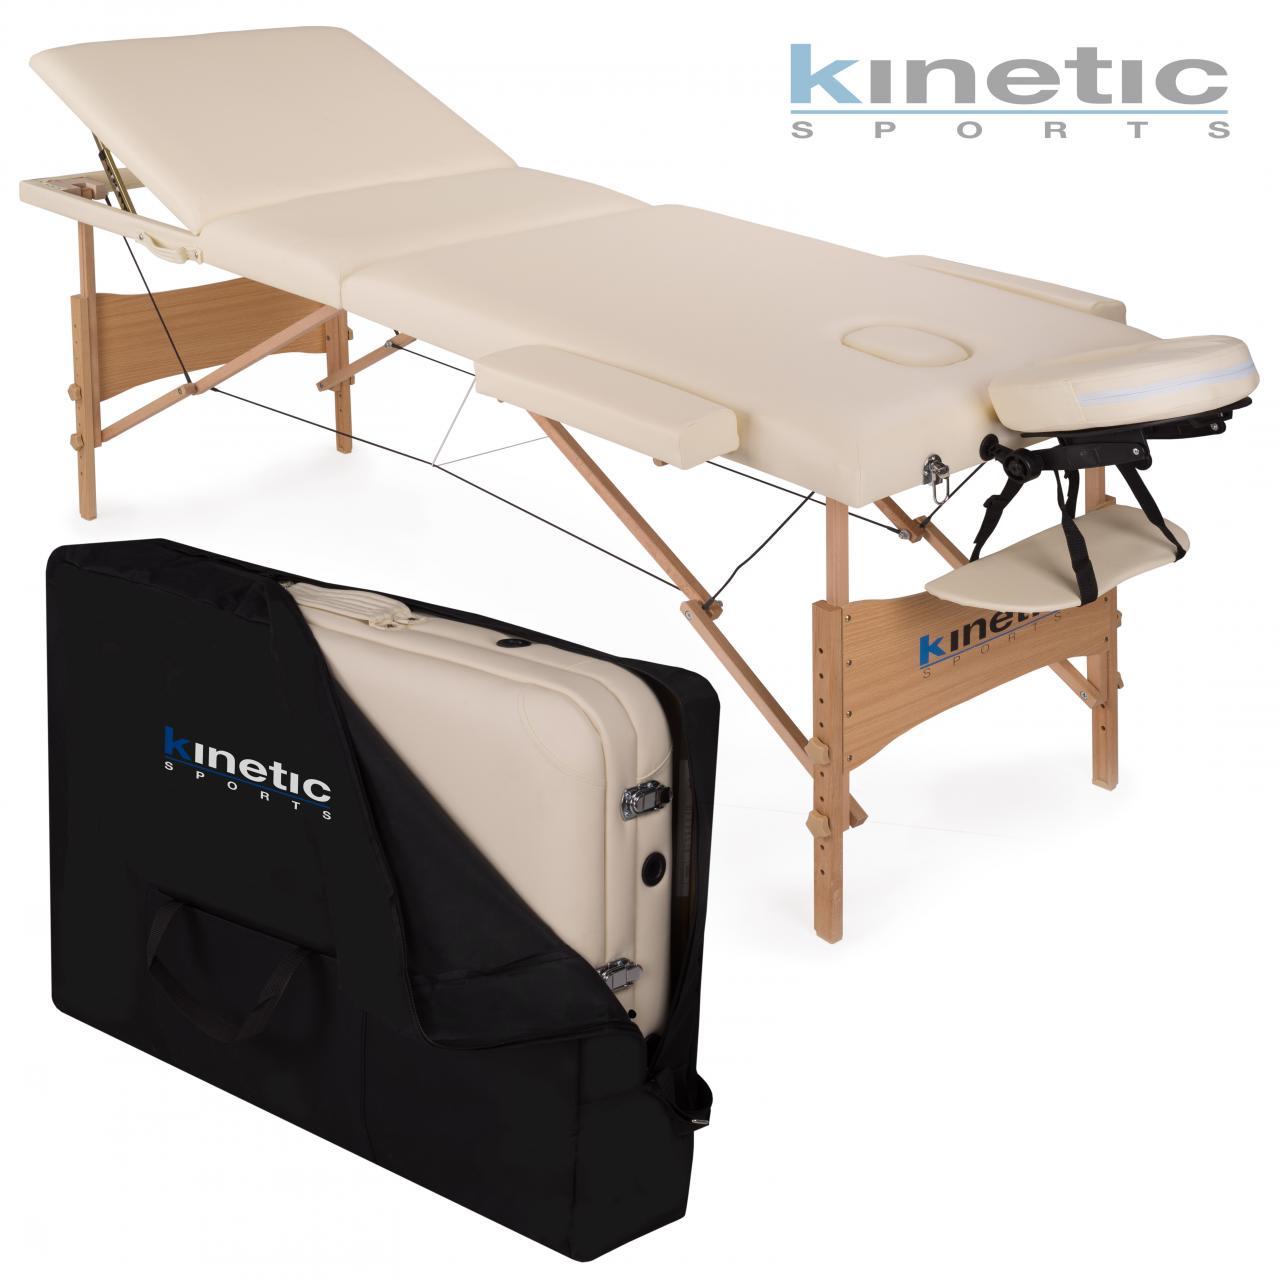 Portable folding lightweight massage table beauty salon for Table for beauty salon